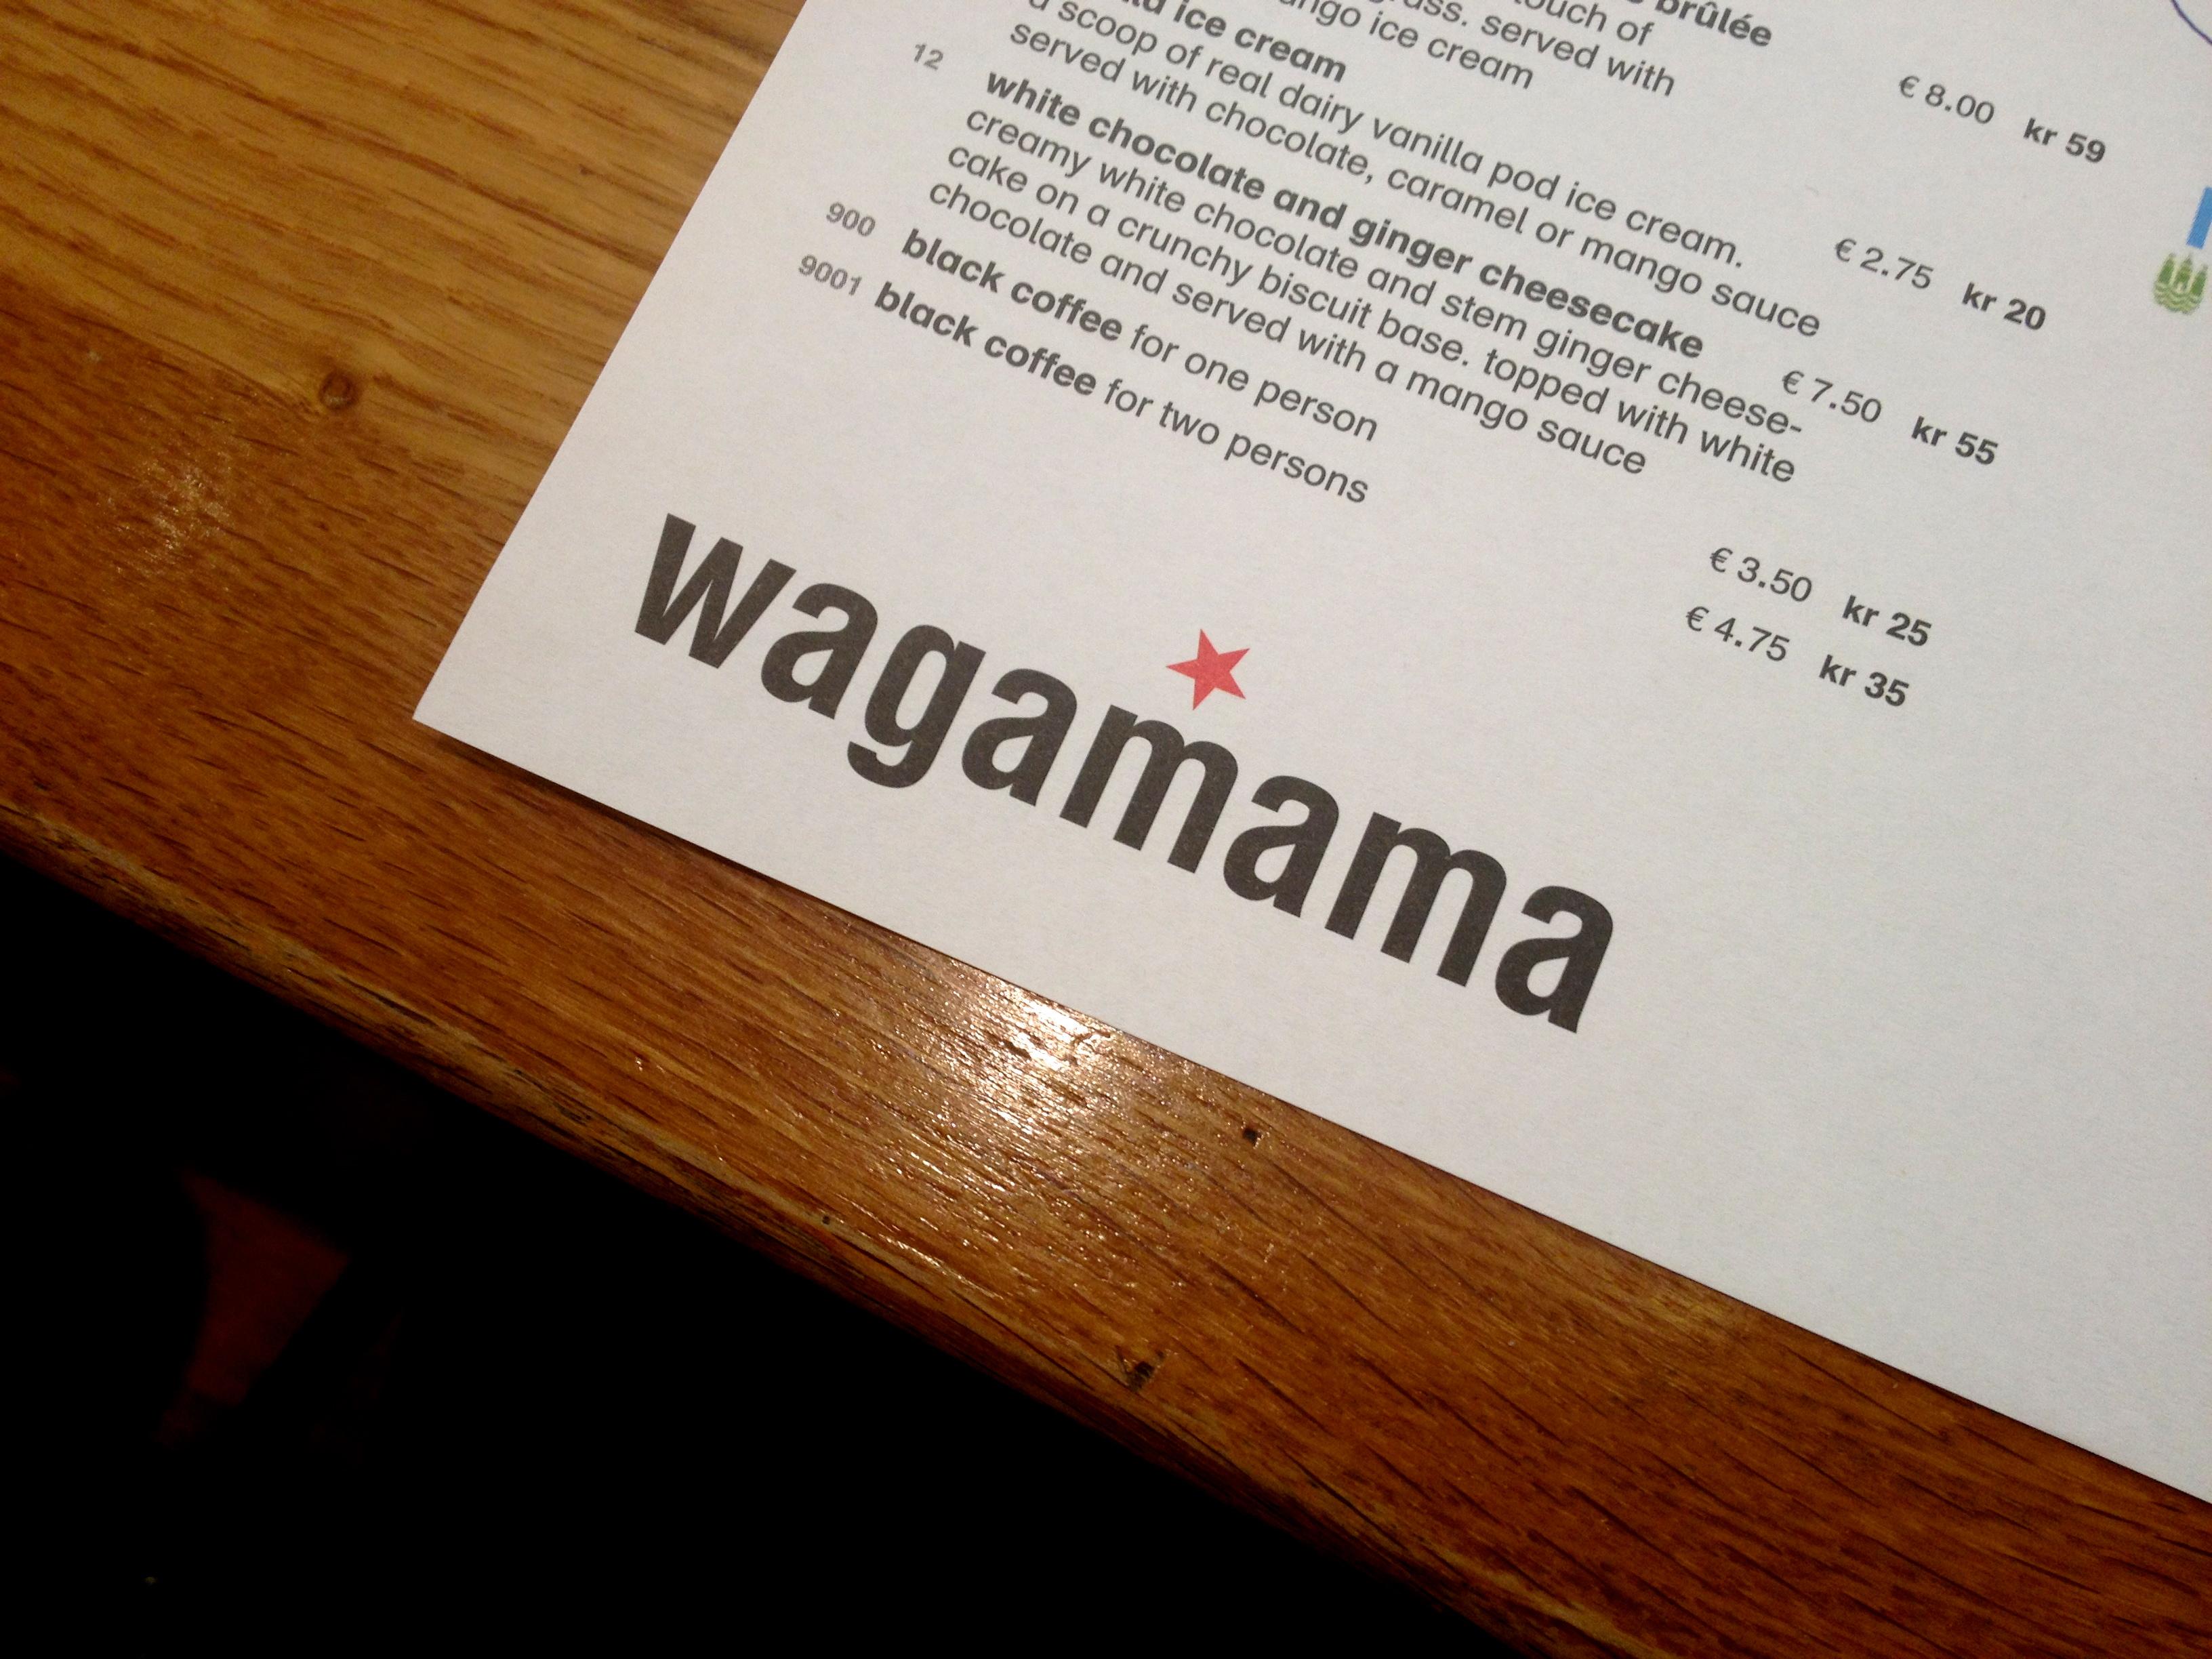 wagamama_logo